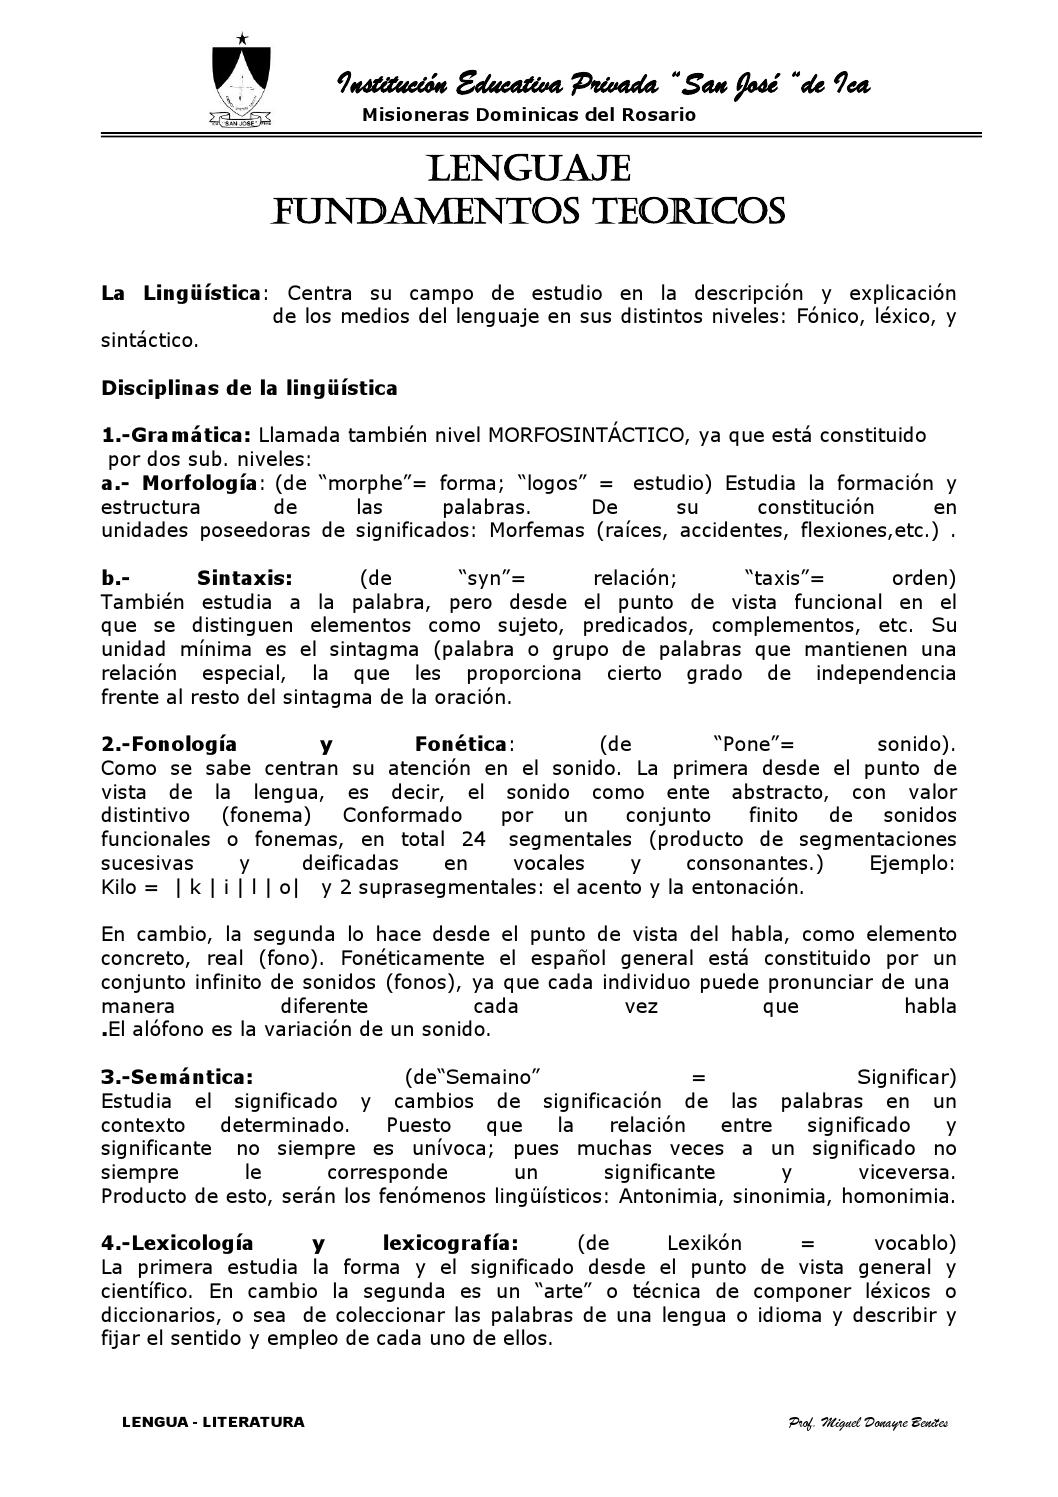 Lengualiteratura by Miguel Ángel Donayre Benites - issuu